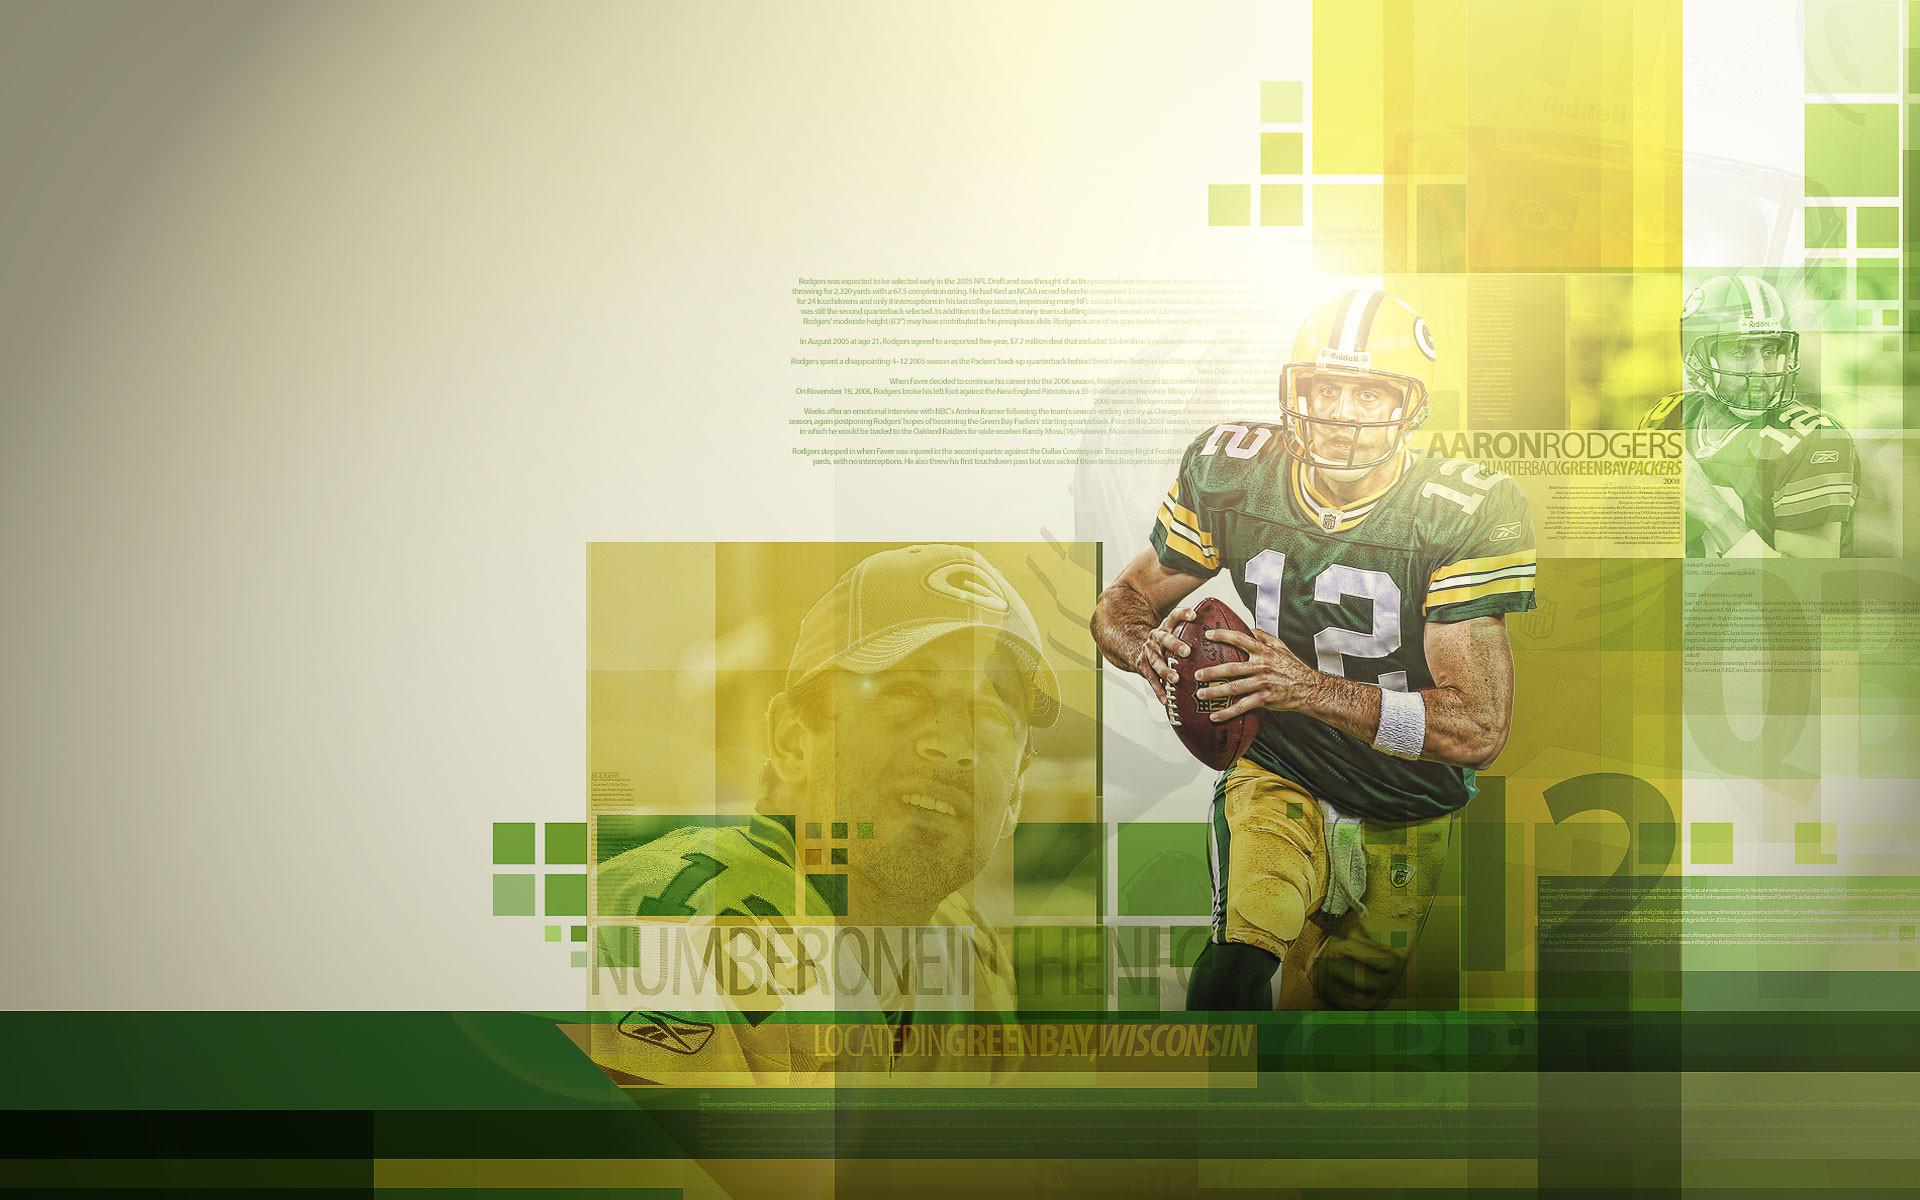 Aaron Rodgers Green Bay Packers Widescreen Wallpaper